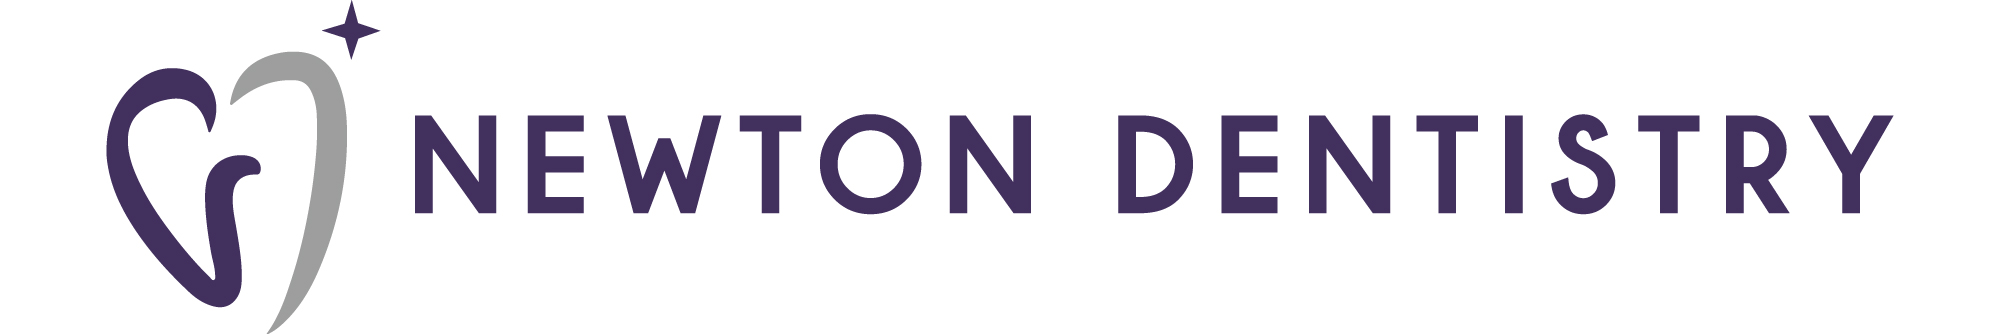 Newton Dentistry Logo